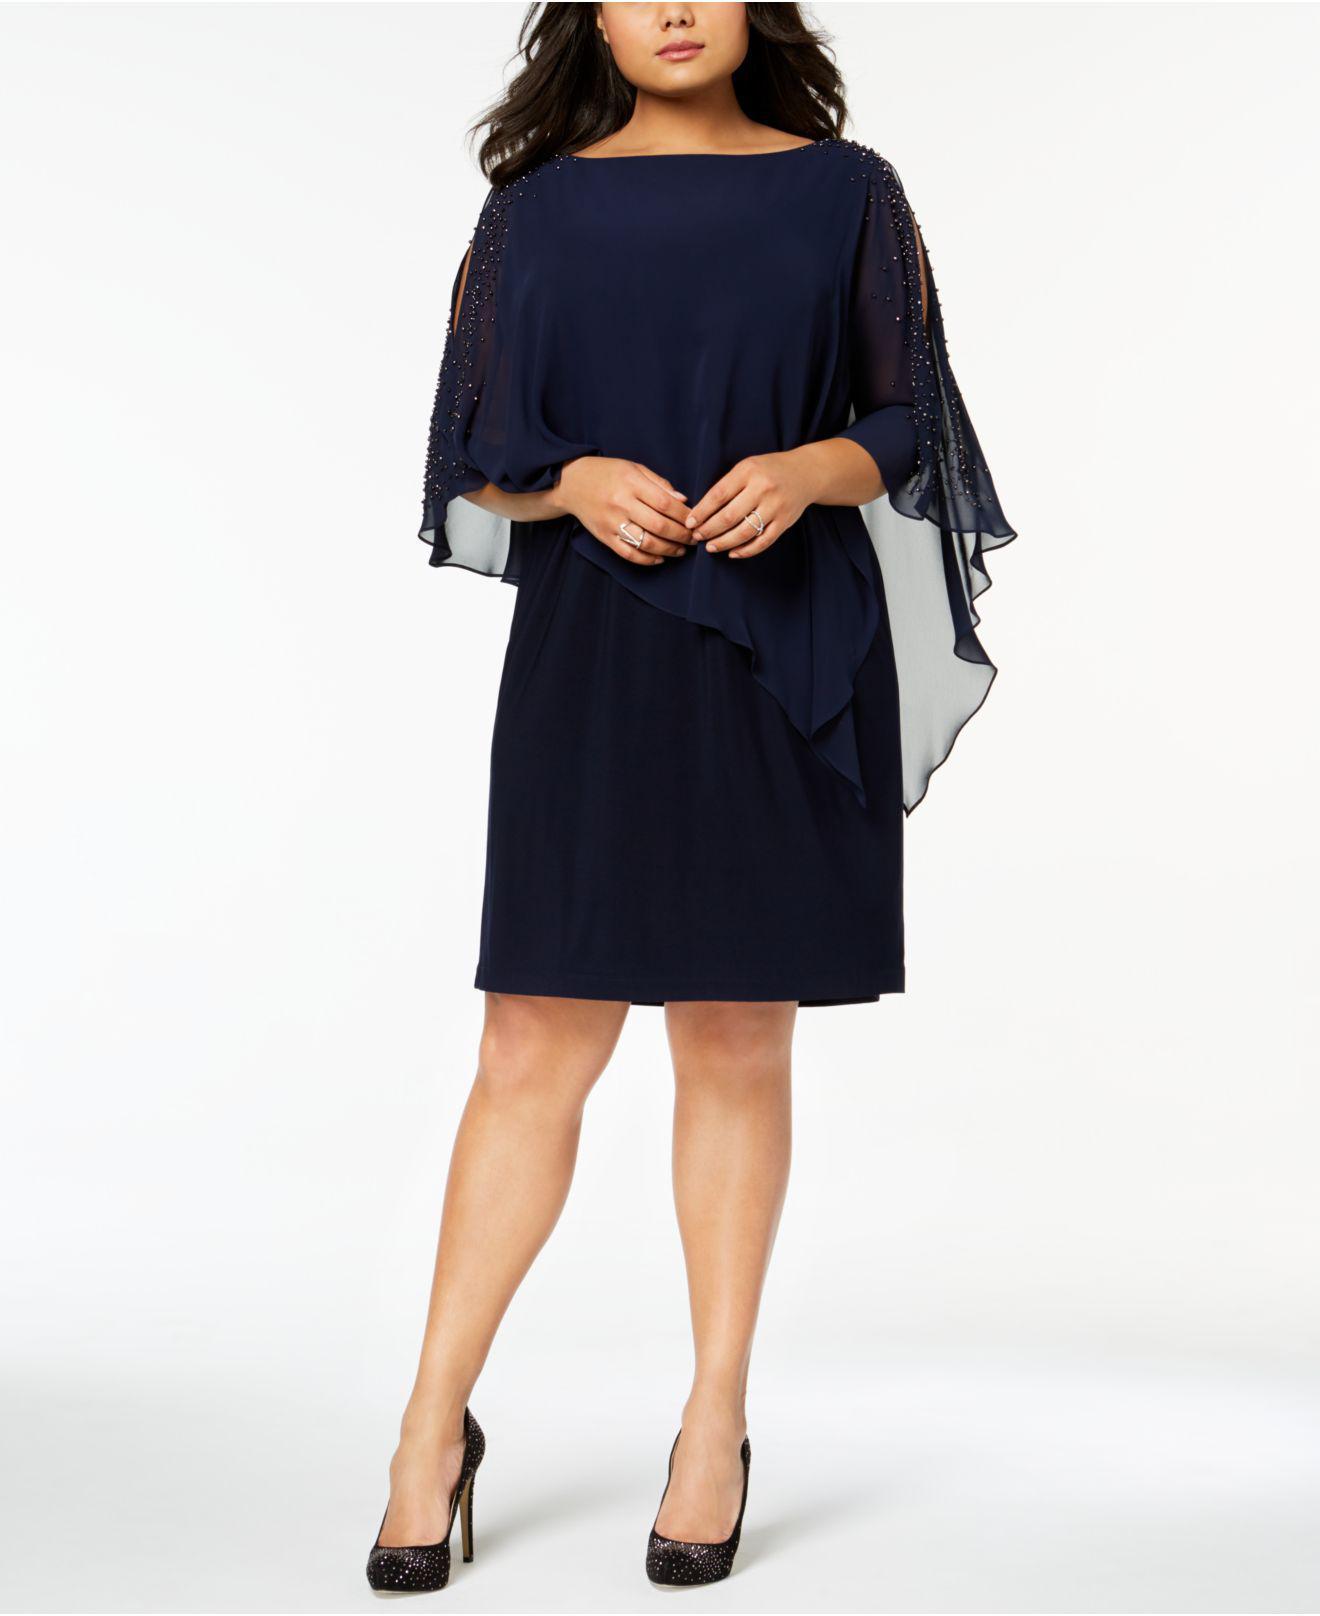 aee736d2c6e Xscape Plus Size Beaded Chiffon Popover Dress in Blue - Lyst